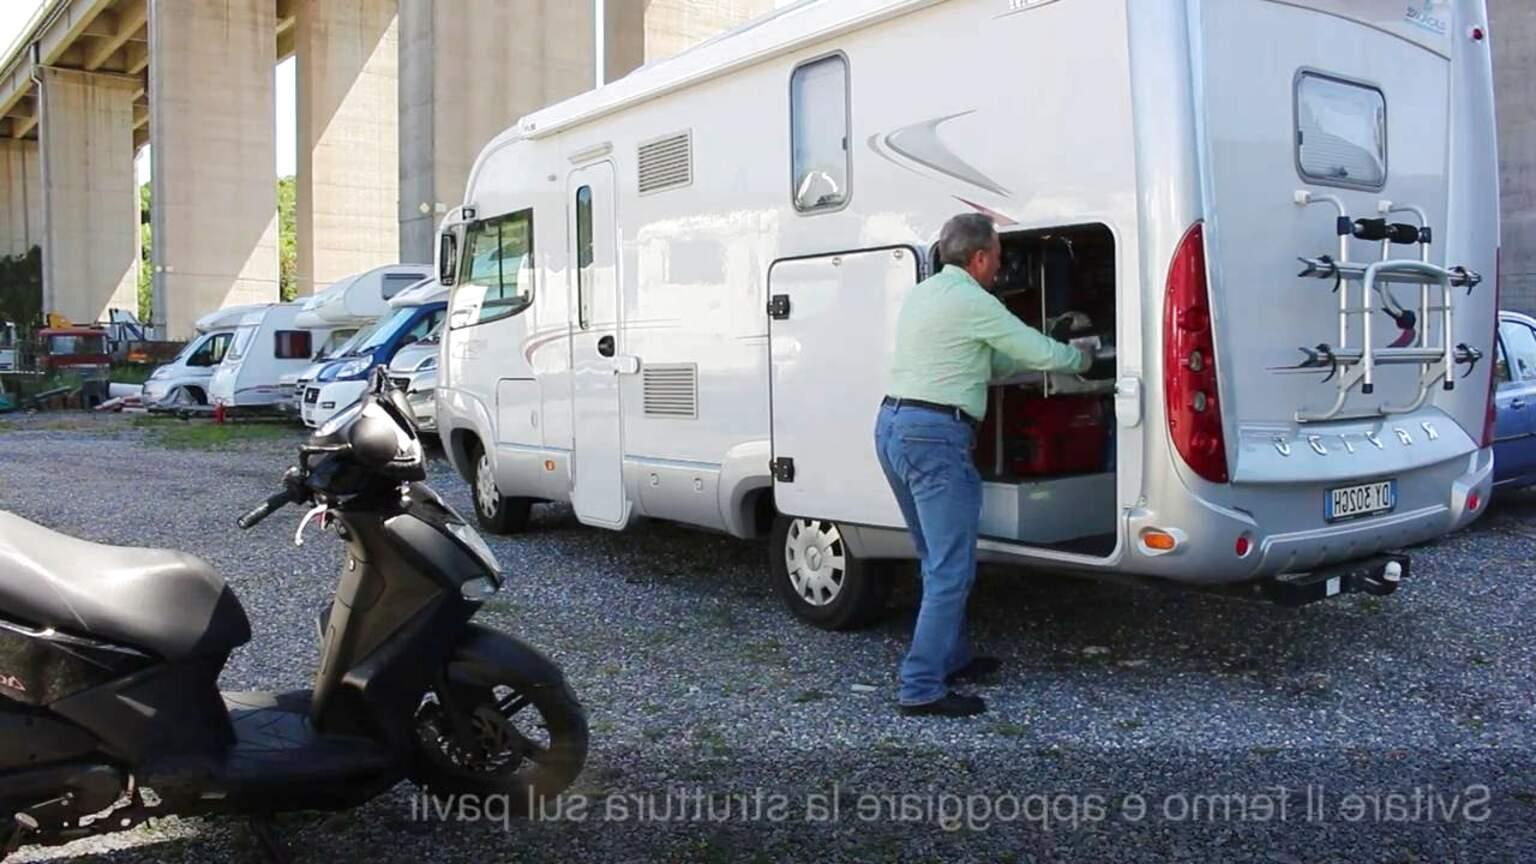 porta moto camper garage usato